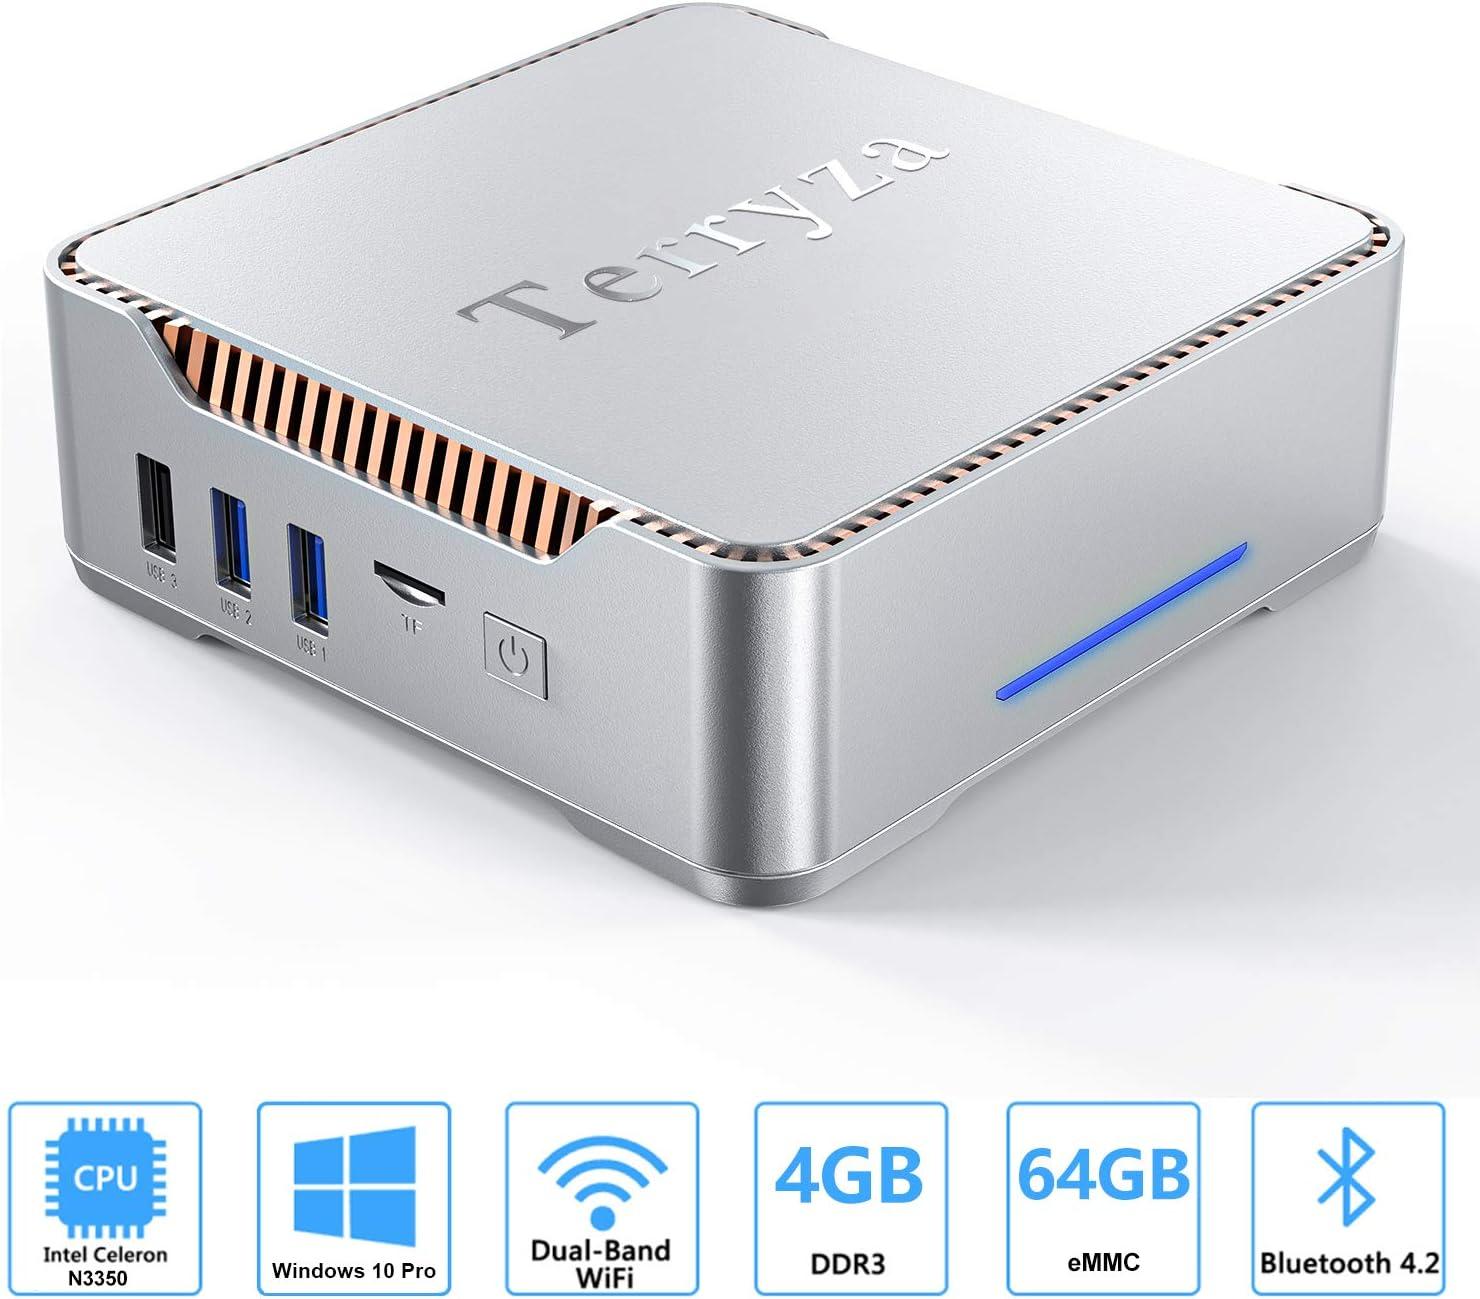 AK3 Mini PC with Intel Celeron N3350 & Windows 10 Pro, 4GB DDR3/ 64GB eMMC Desktop Computer,2.4G/5G Dual WiFi, 4K HD, HDMI/VGA Ports